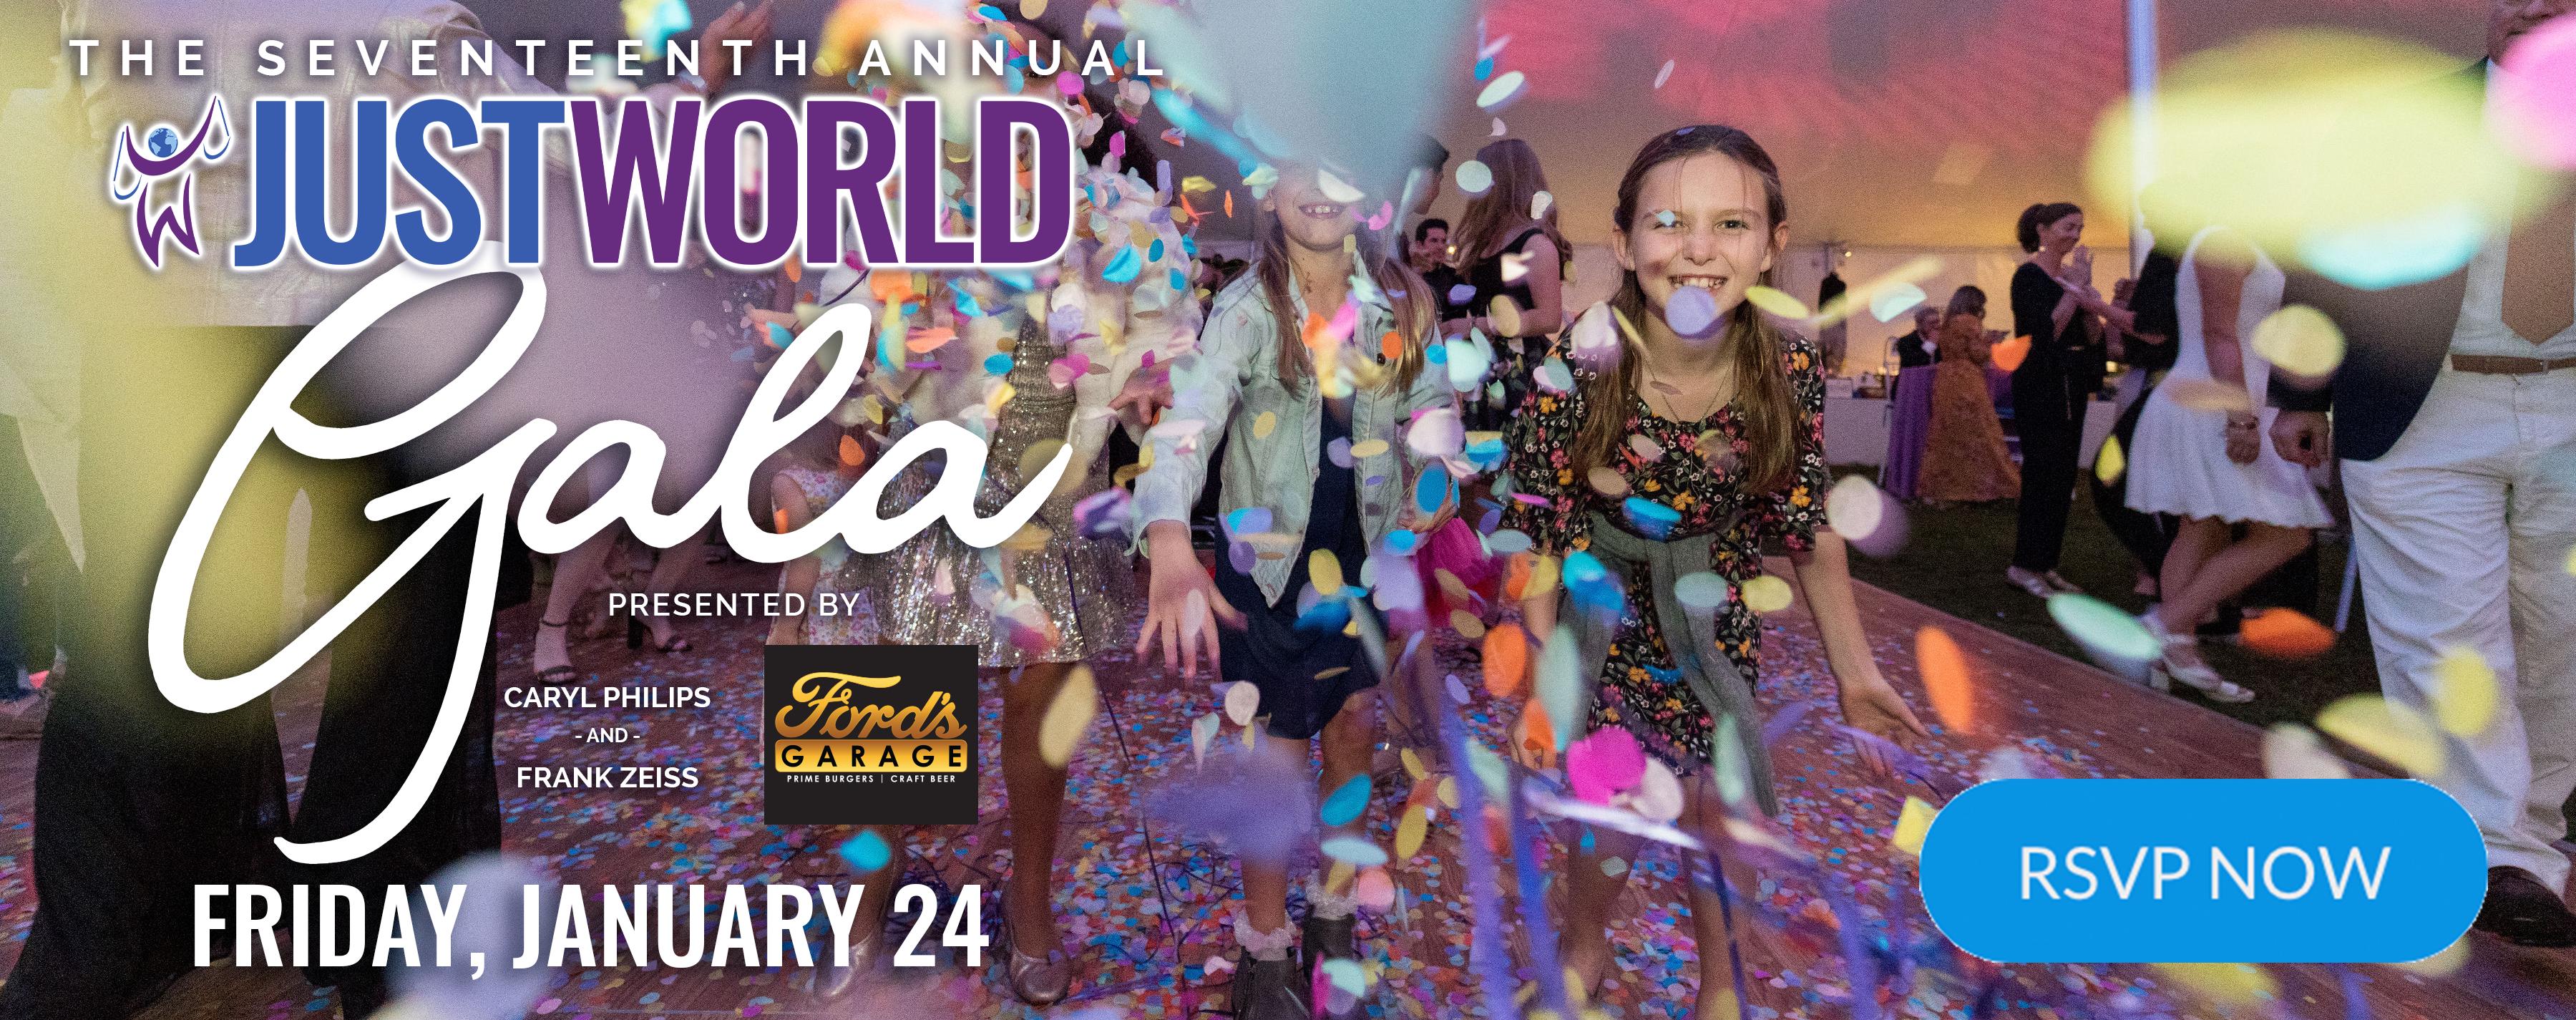 The Seventeenth Annual JustWorld Gala